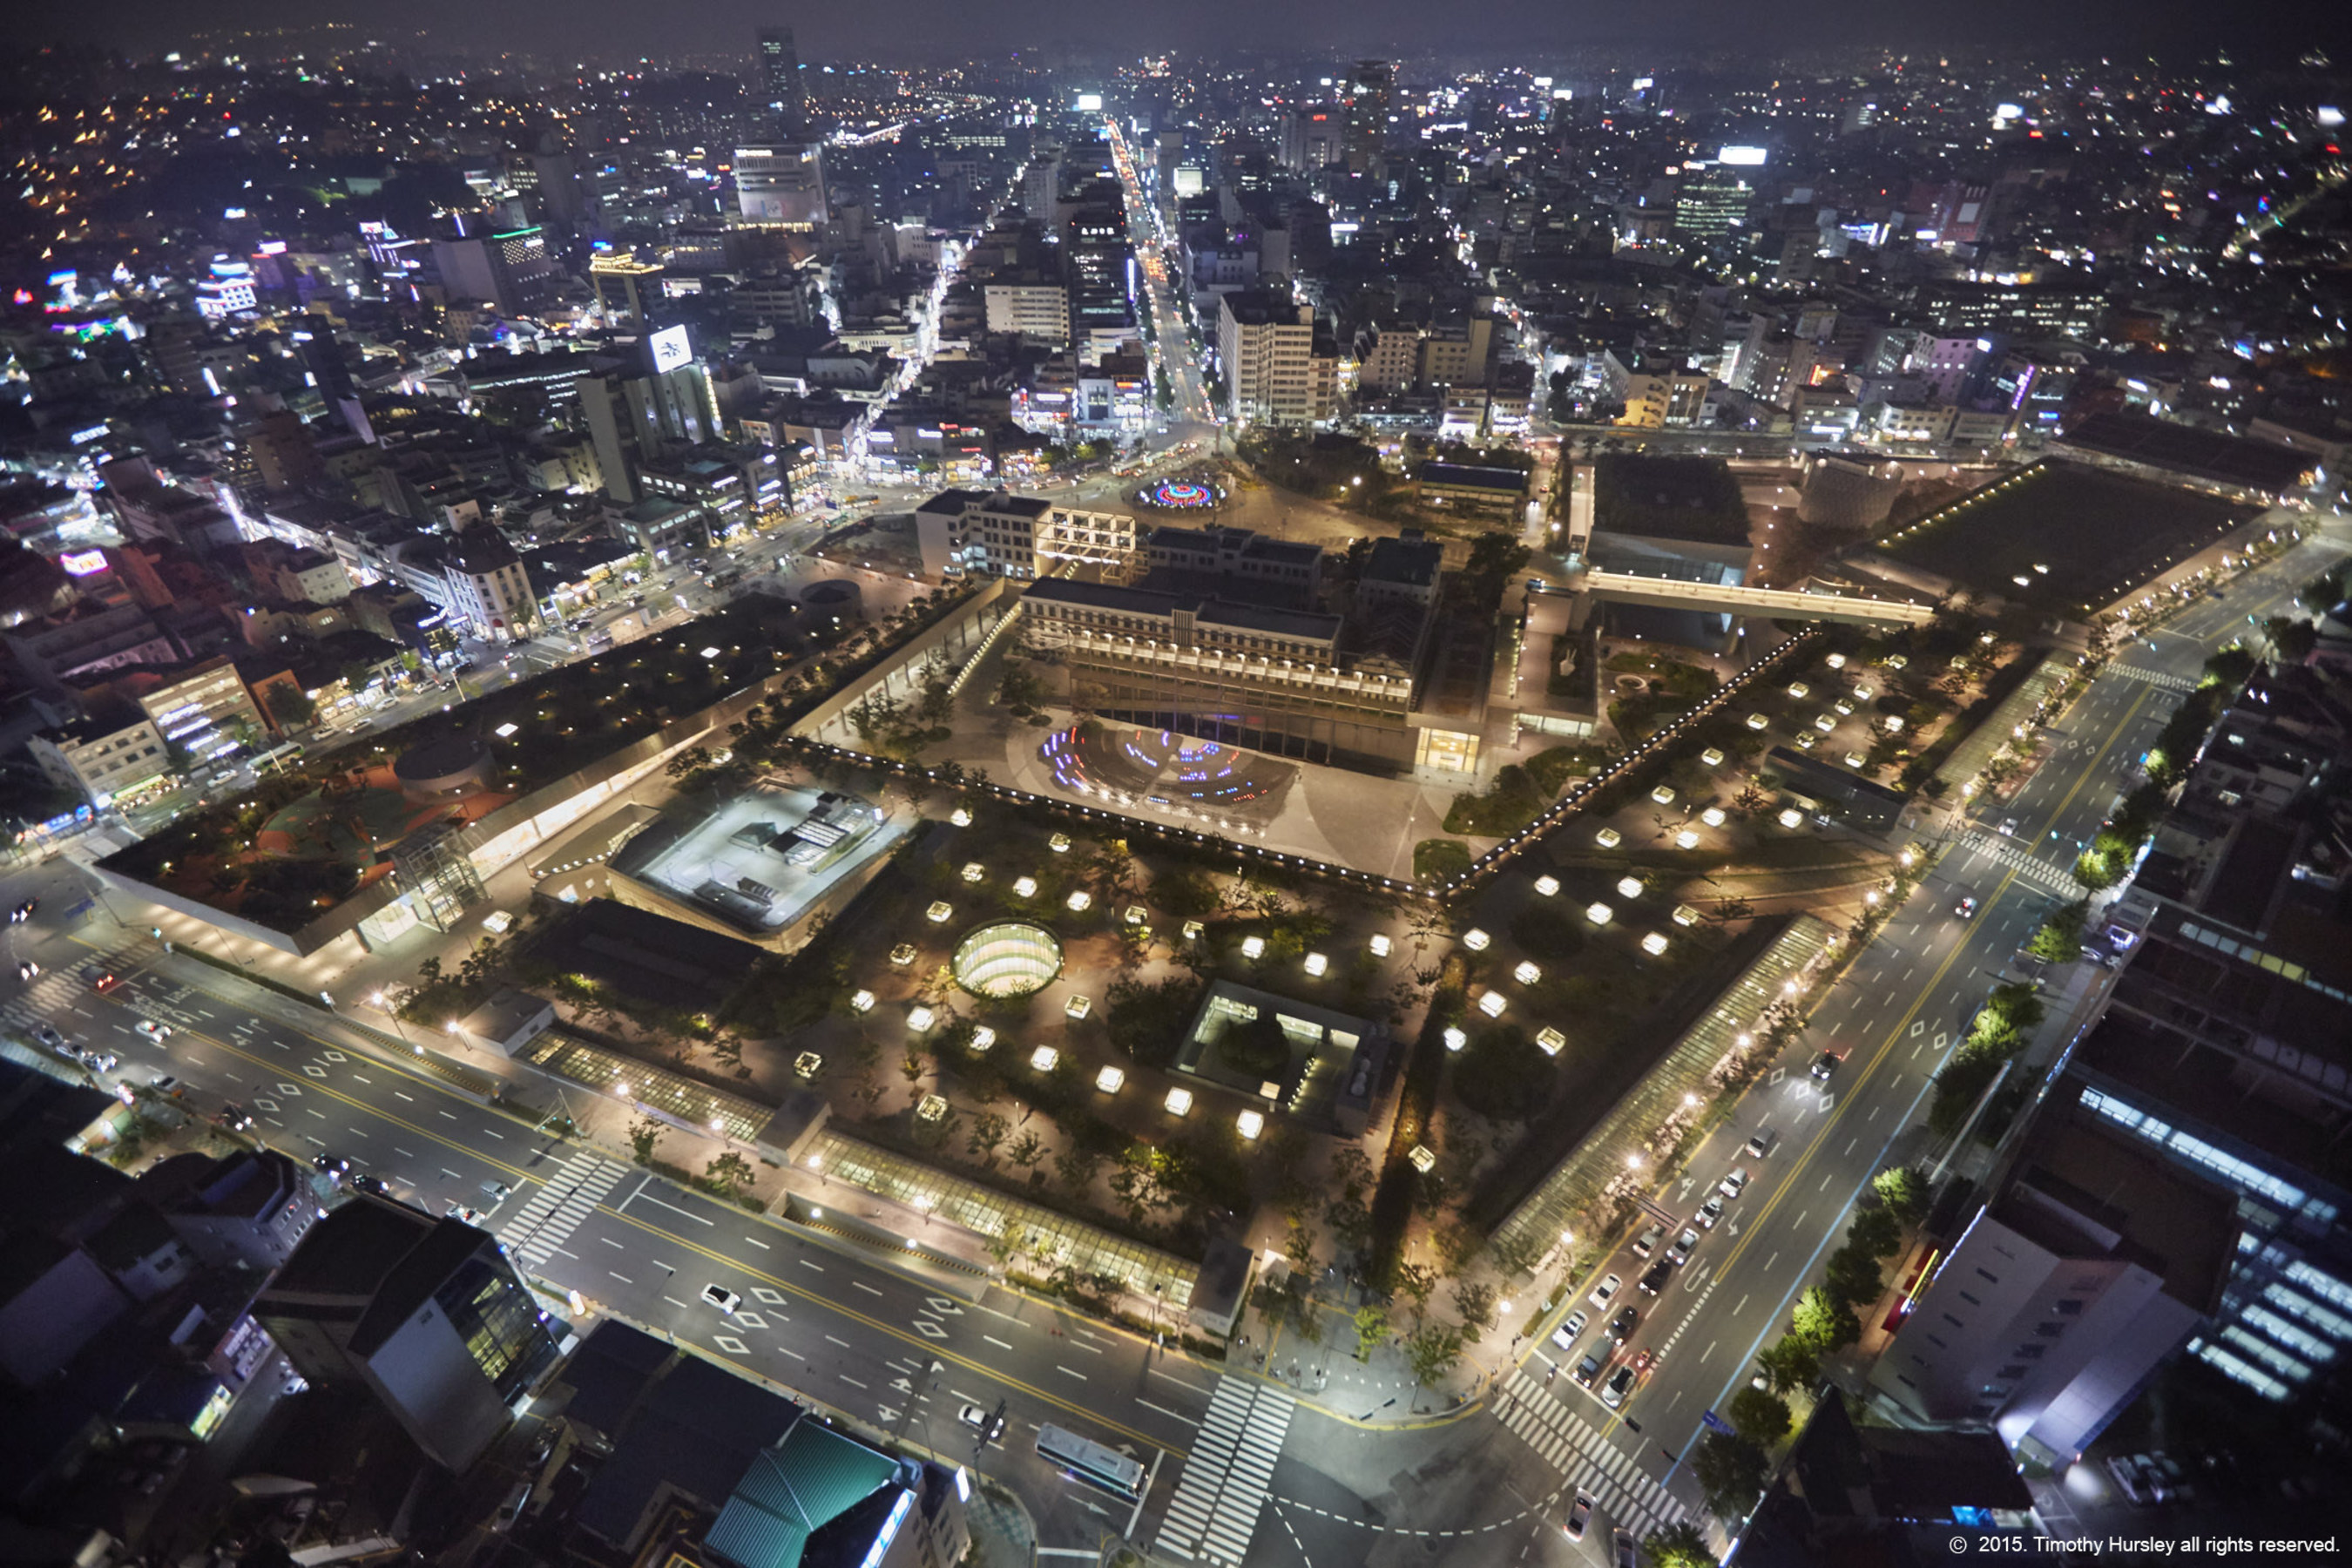 Grand opening of Asia Culture Center (ACC) in Gwangju, Korea, Asia's Cultural Window to the World